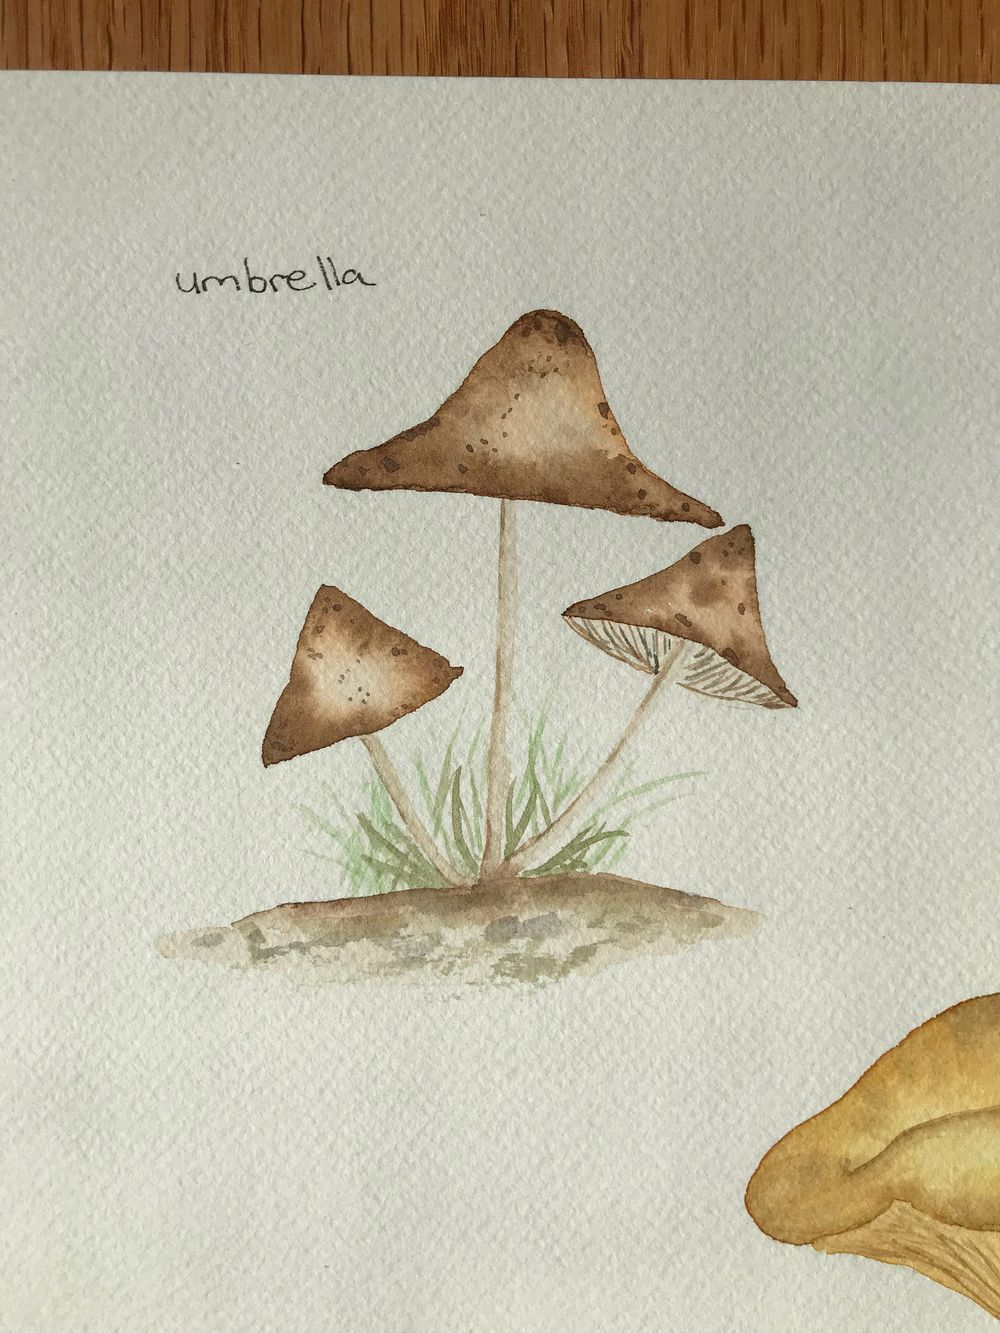 Mushrooms - image 7 - student project